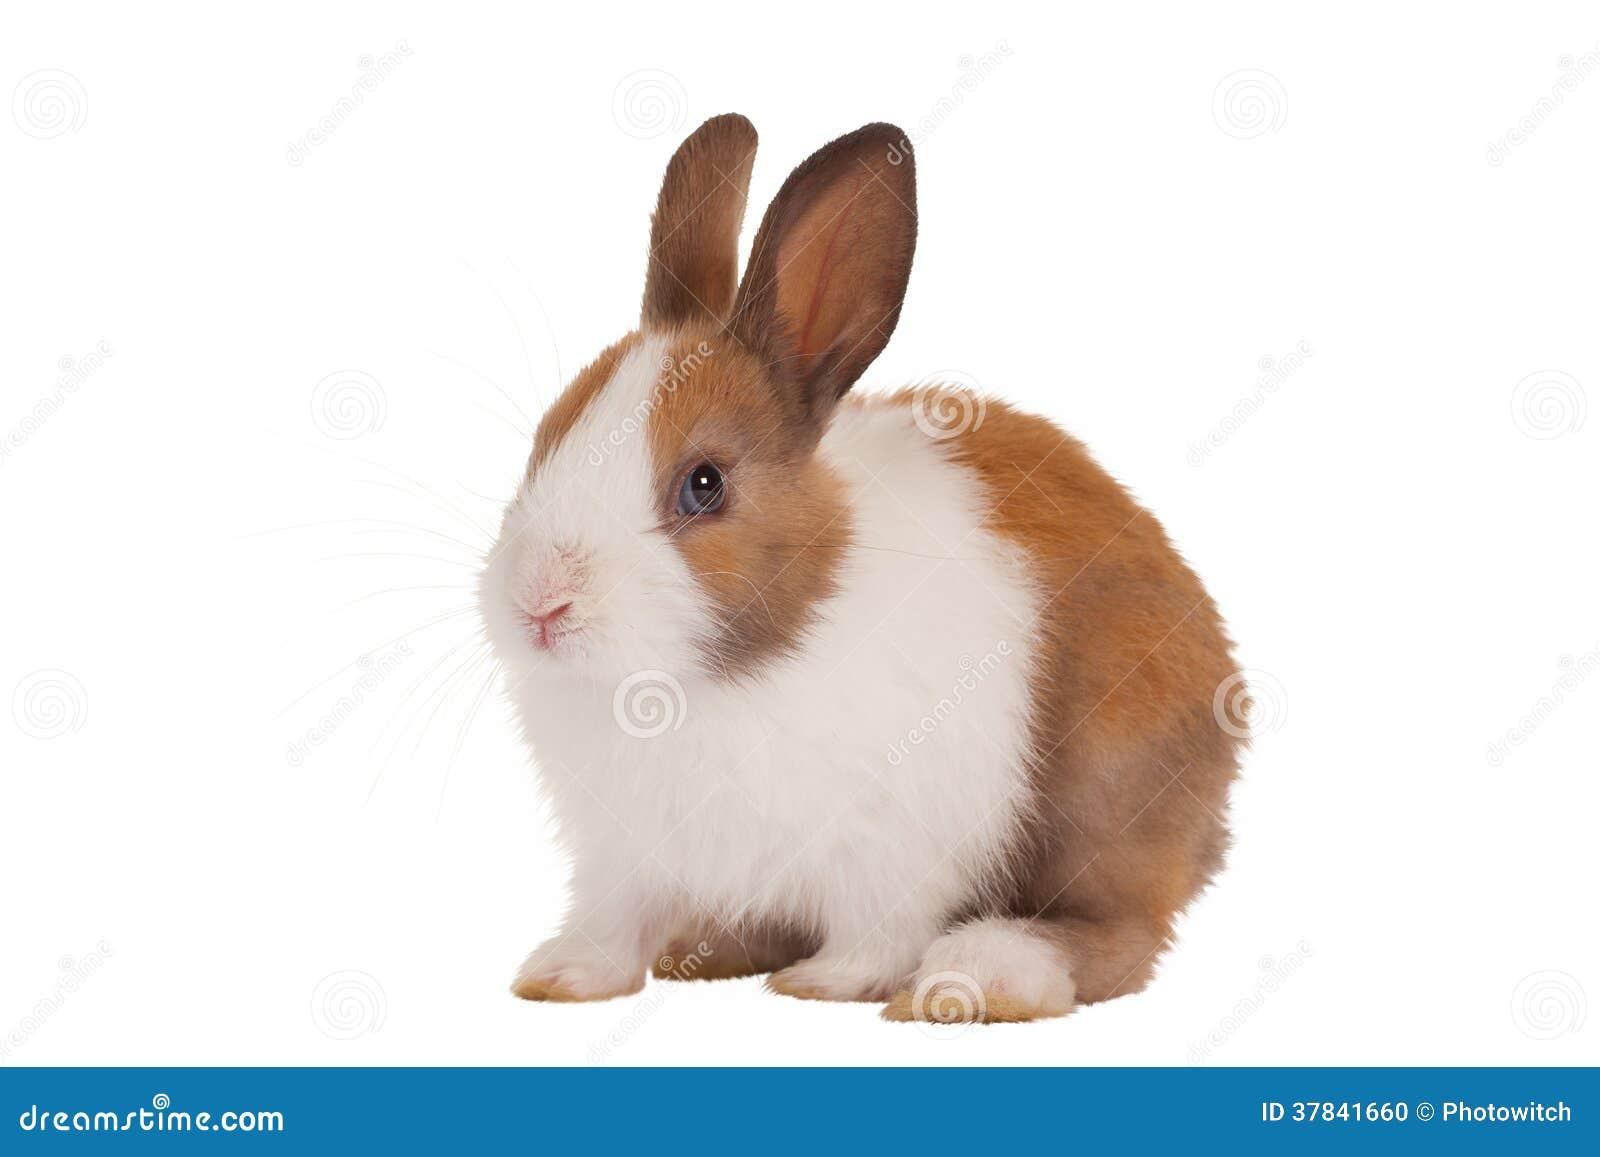 Cute Baby Bunny Stock Photo Image 37841660